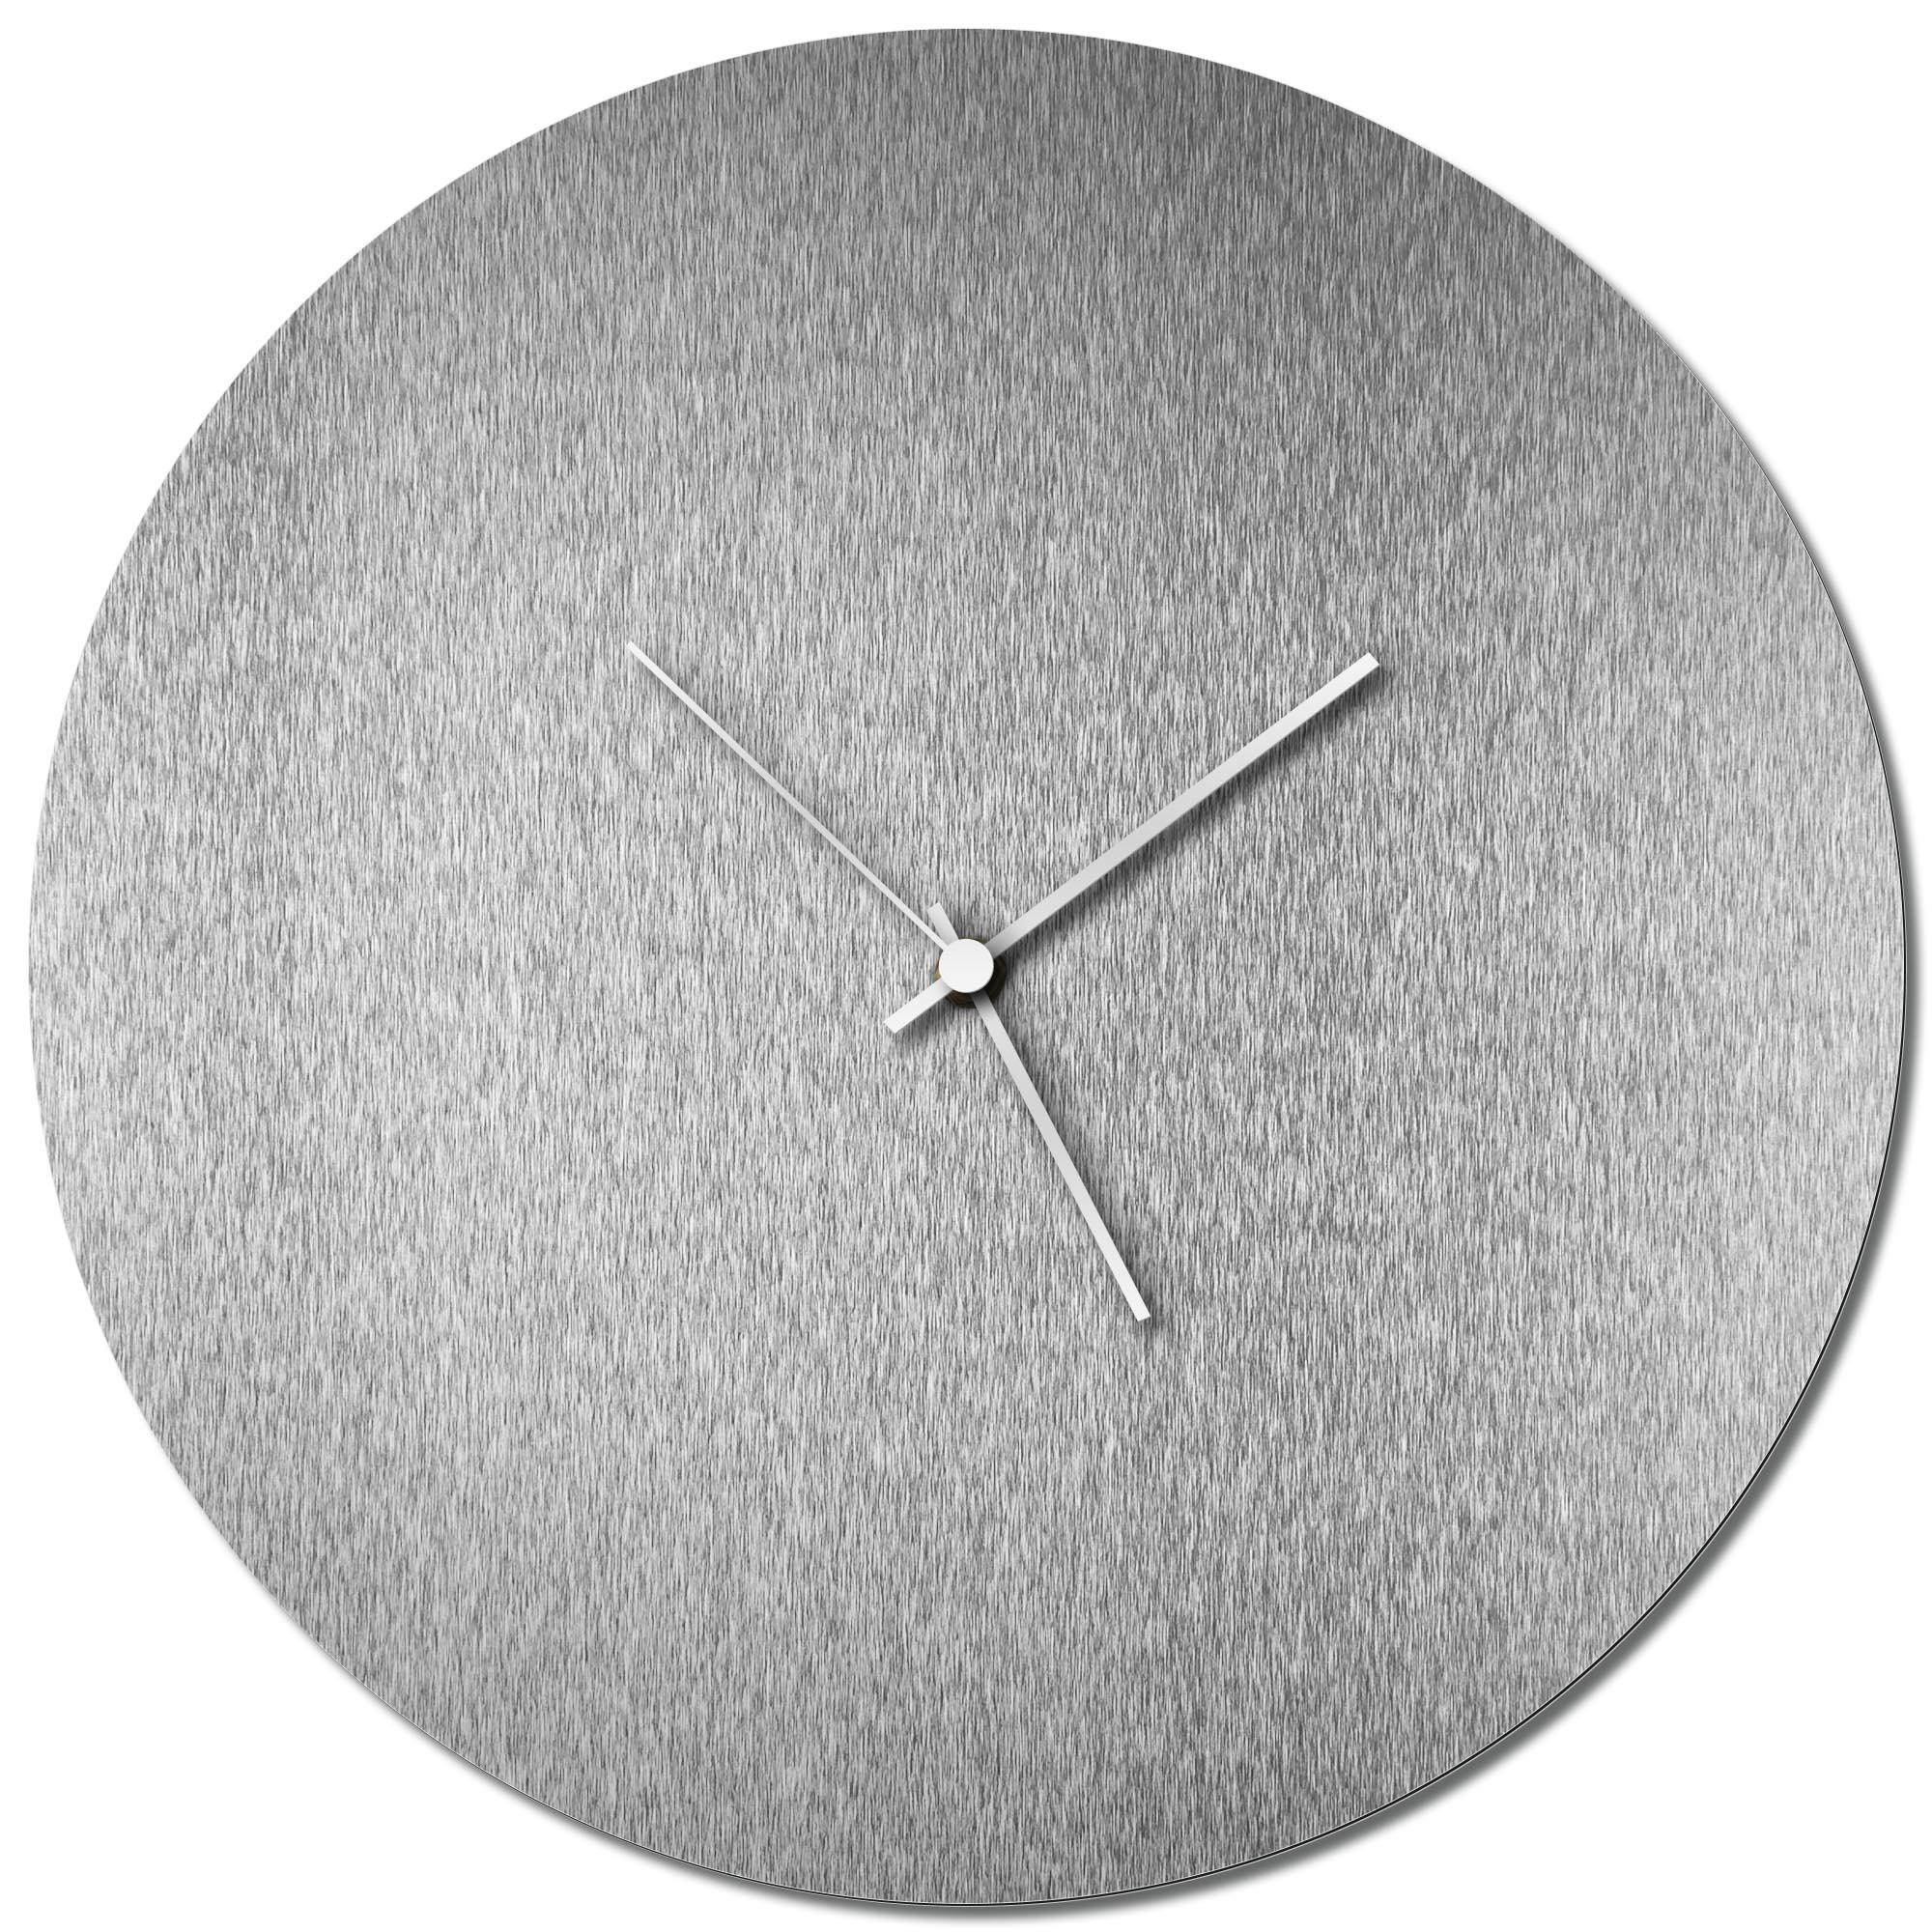 Adam Schwoeppe 'Silversmith Circle Clock Large White' Midcentury Modern Style Wall Clock